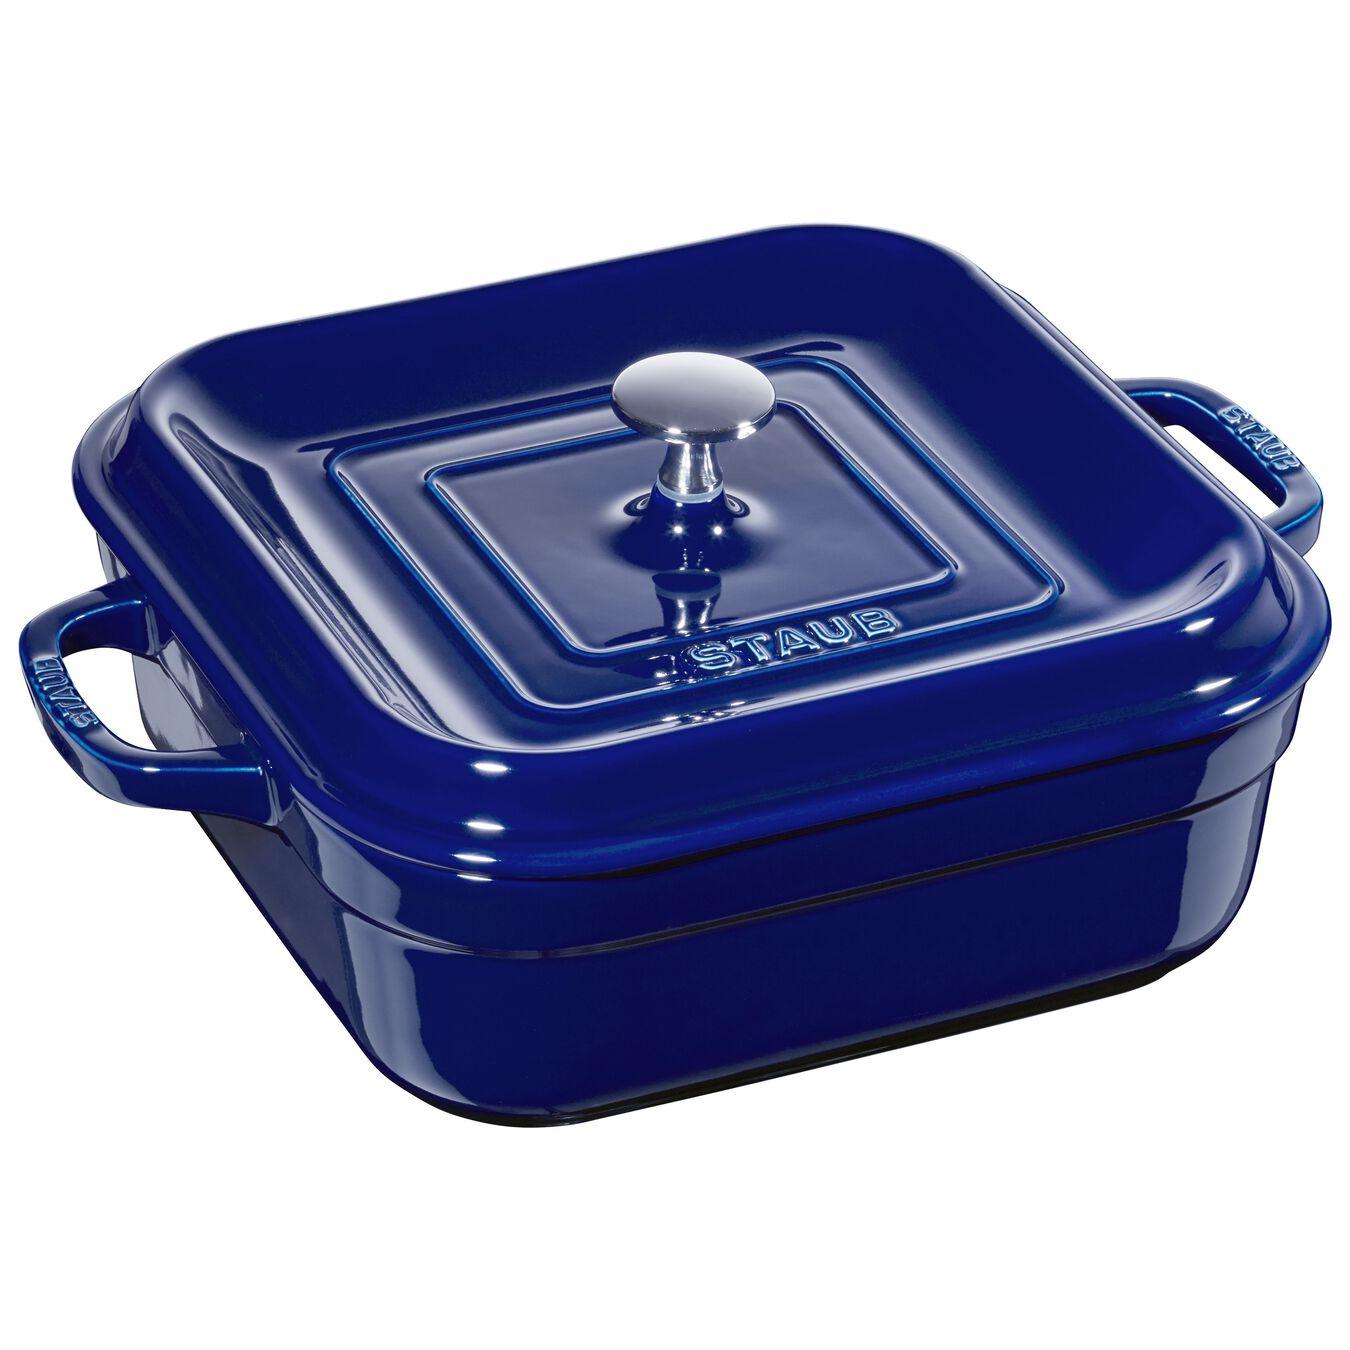 Ceramic square Plat empilable, Dark-Blue,,large 1